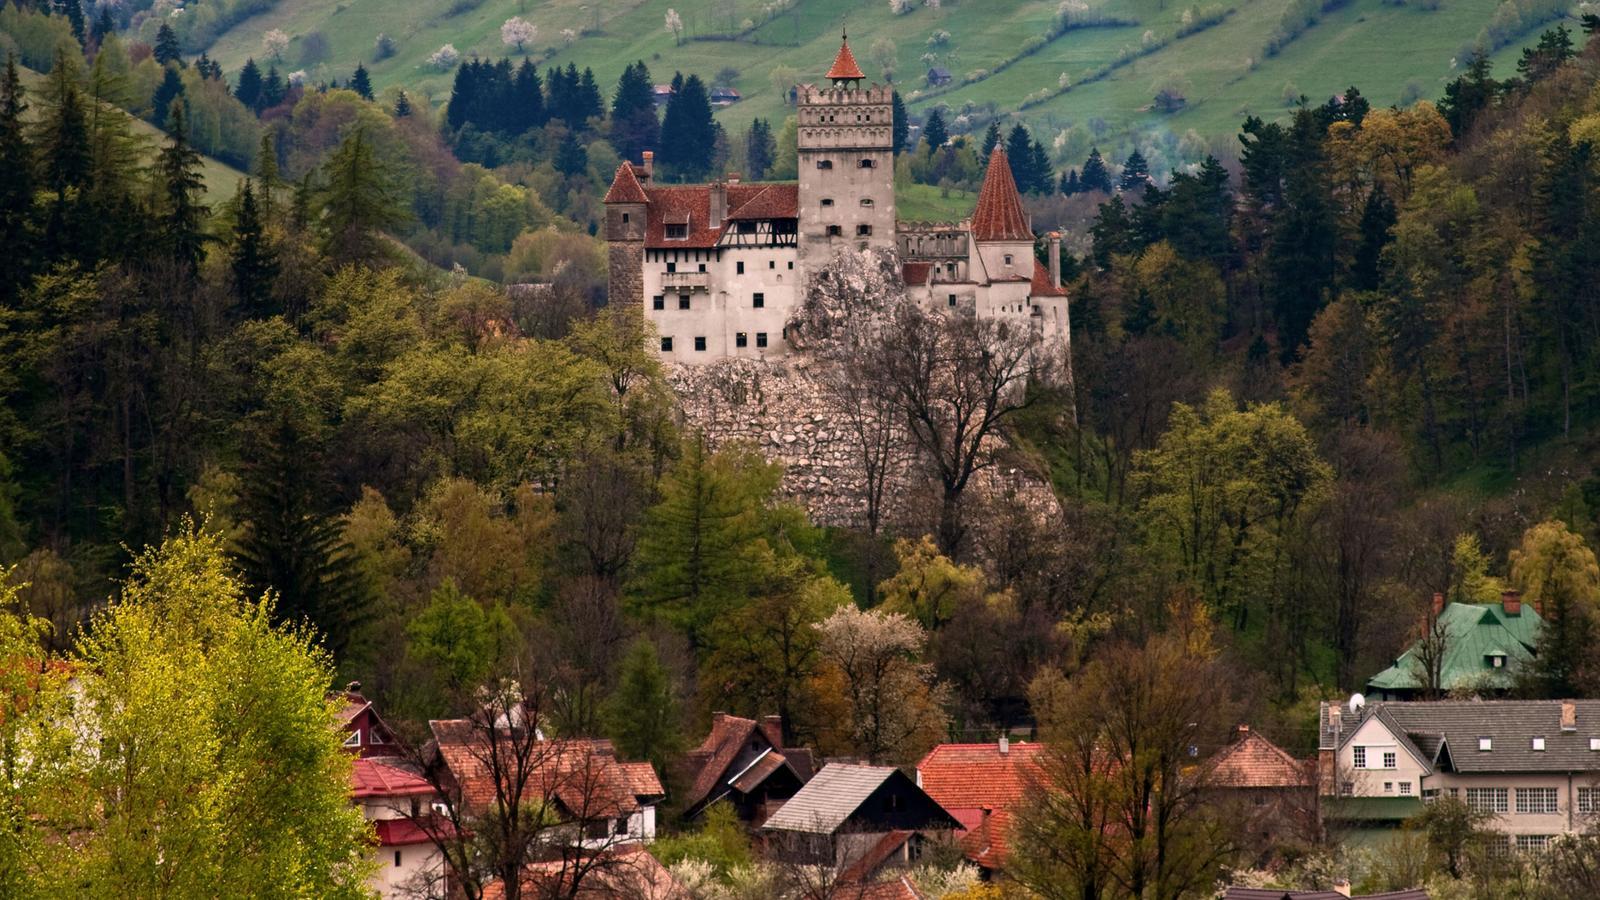 Bram Castle, the inspiration for Castle Dracula, Transylvania.